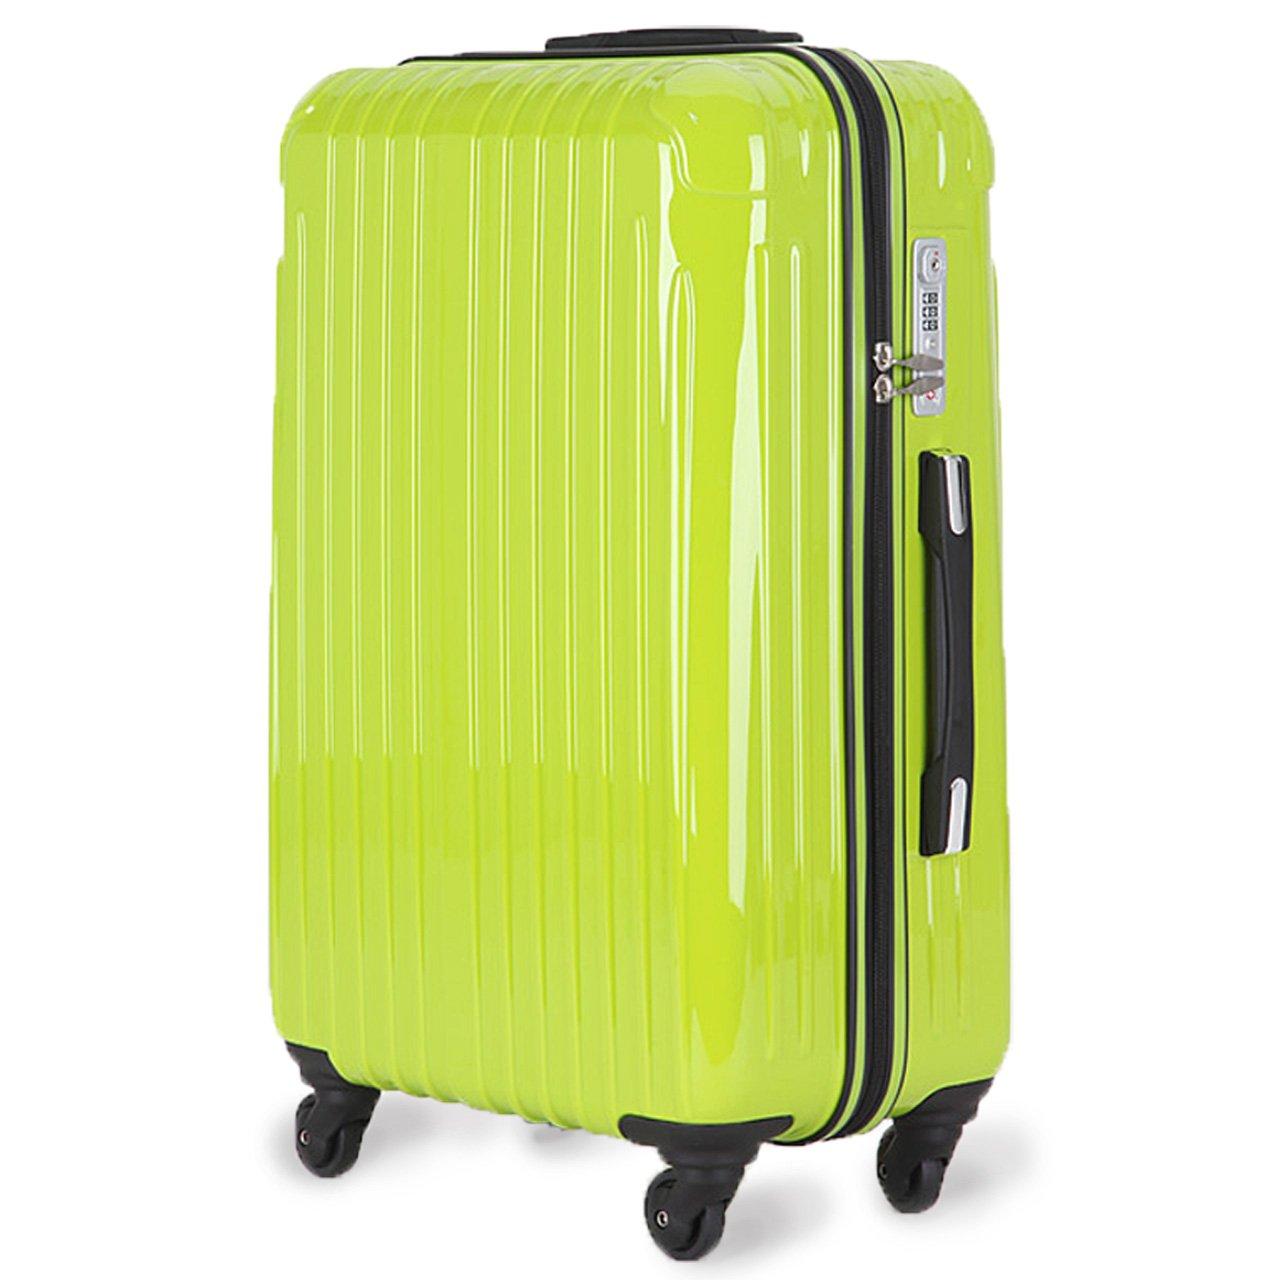 strike[ストライク]超軽量 2年保証 スーツケース TSAロック搭載 旅行バック トランクケース 旅行カバン B072F2GTJP 中型Mサイズ(4-7泊)|アップルグリーン アップルグリーン 中型Mサイズ(4-7泊)